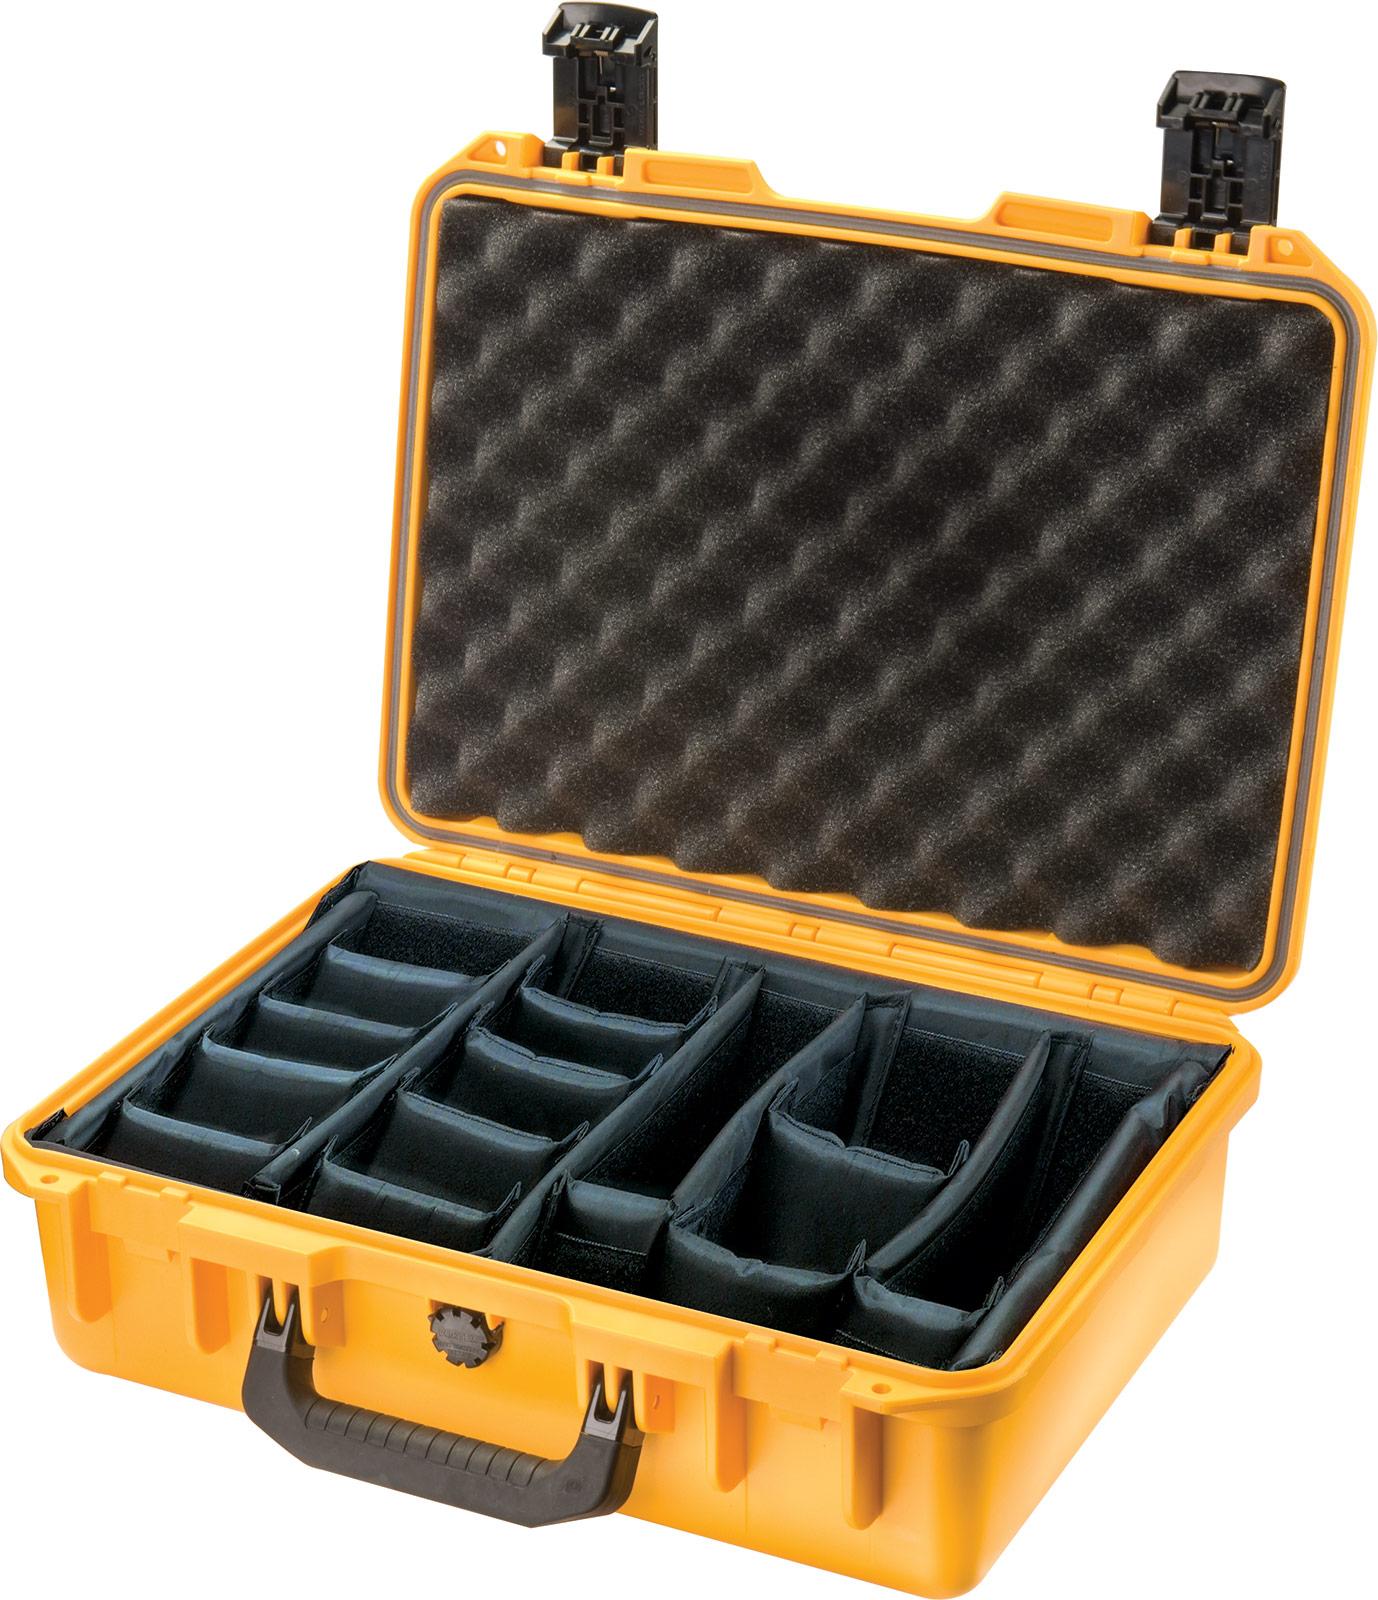 pelican im2300 watertight camera lens case